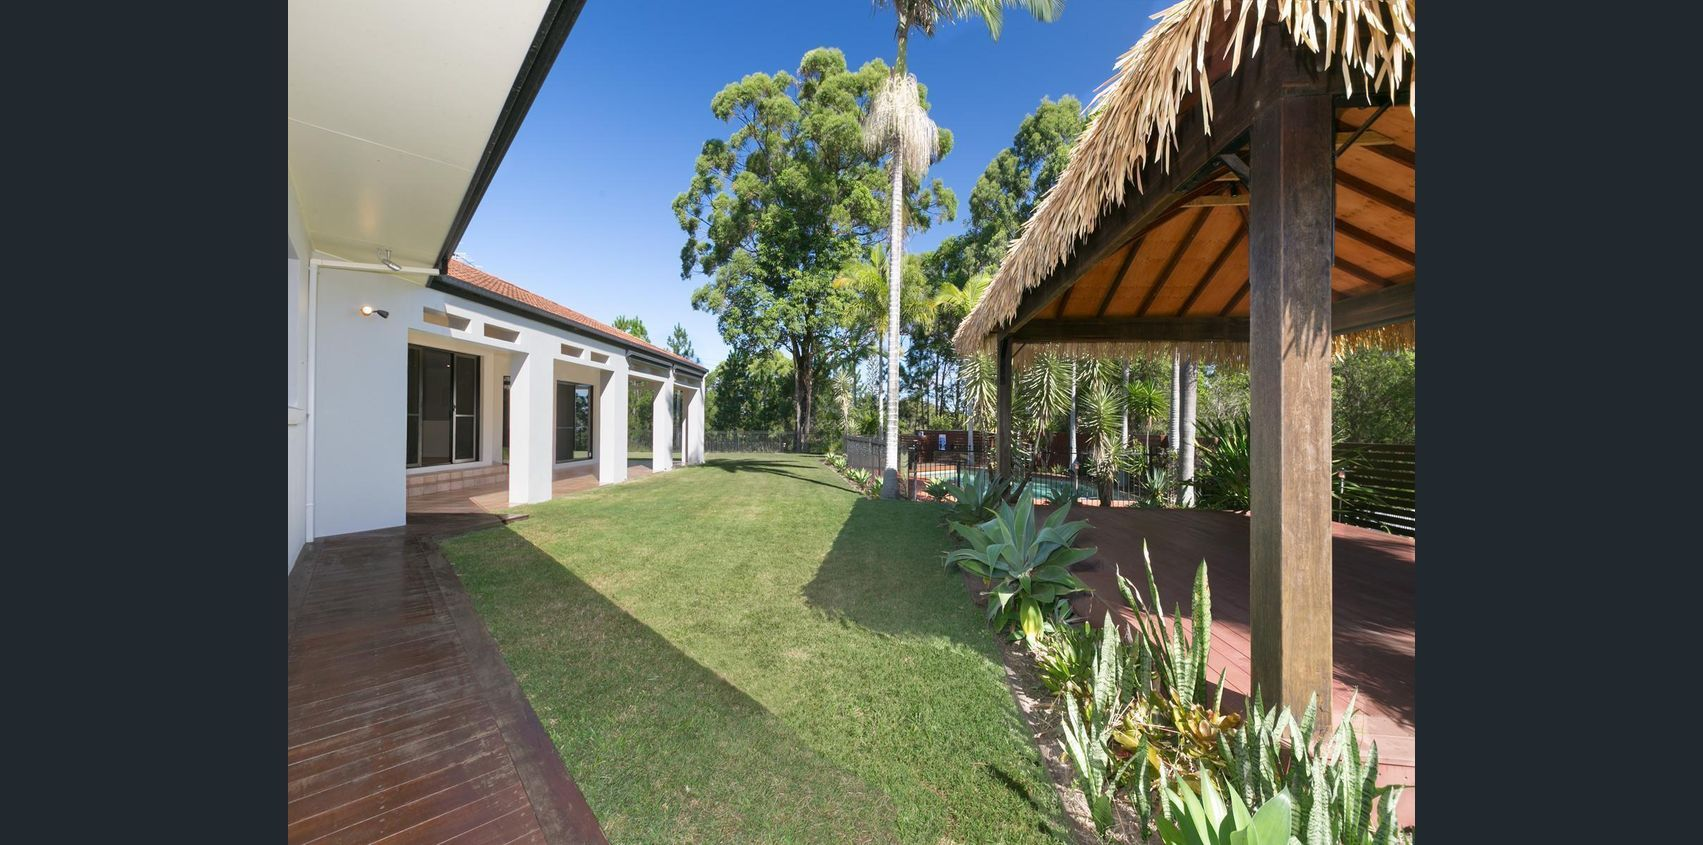 29 Courcheval Terrace, Mons QLD 4556, Image 2